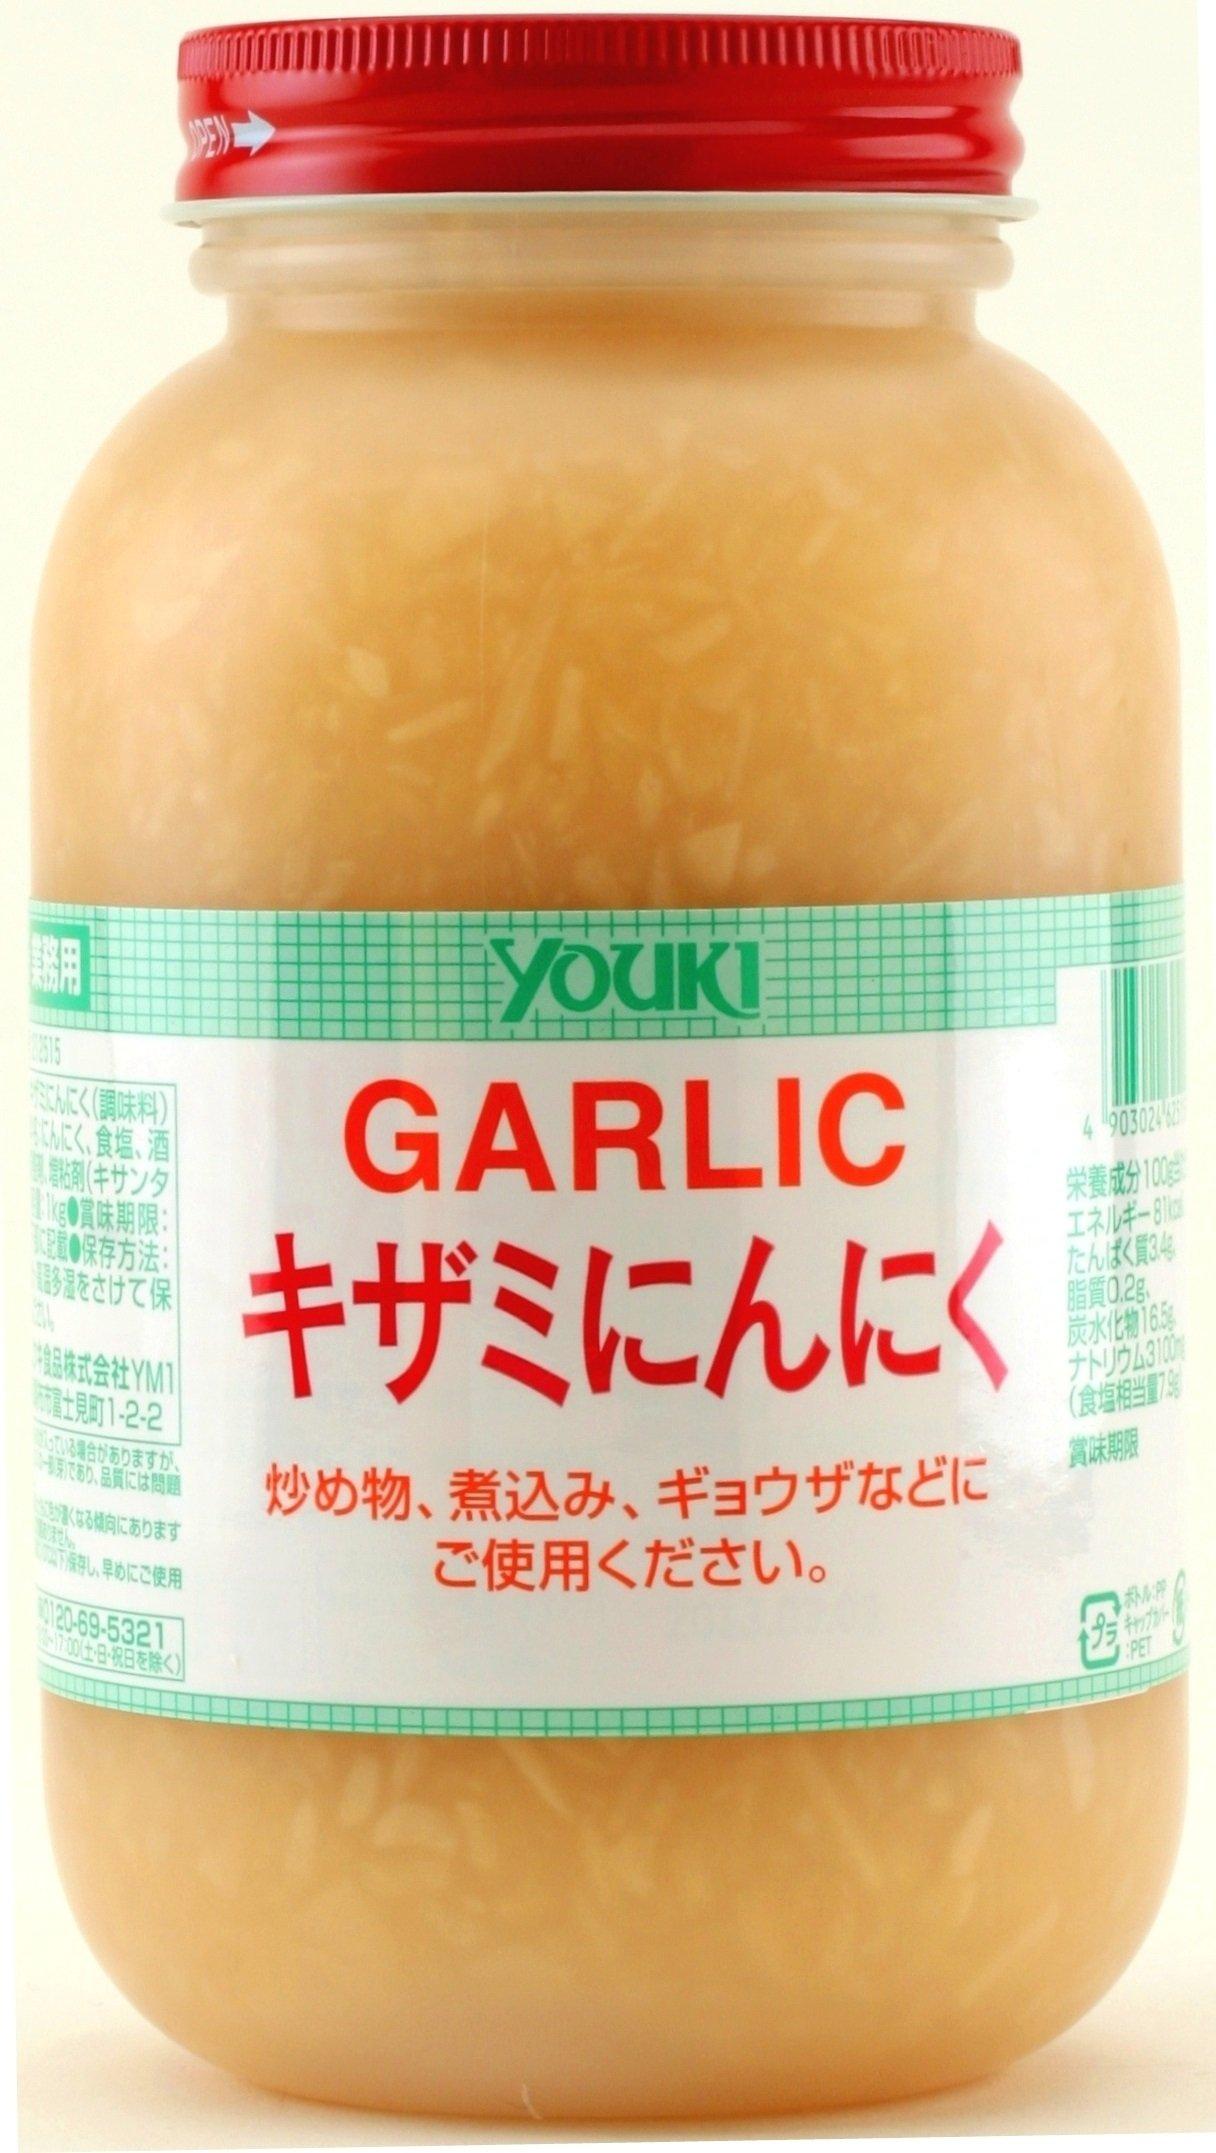 Yuki chopped garlic 1kg